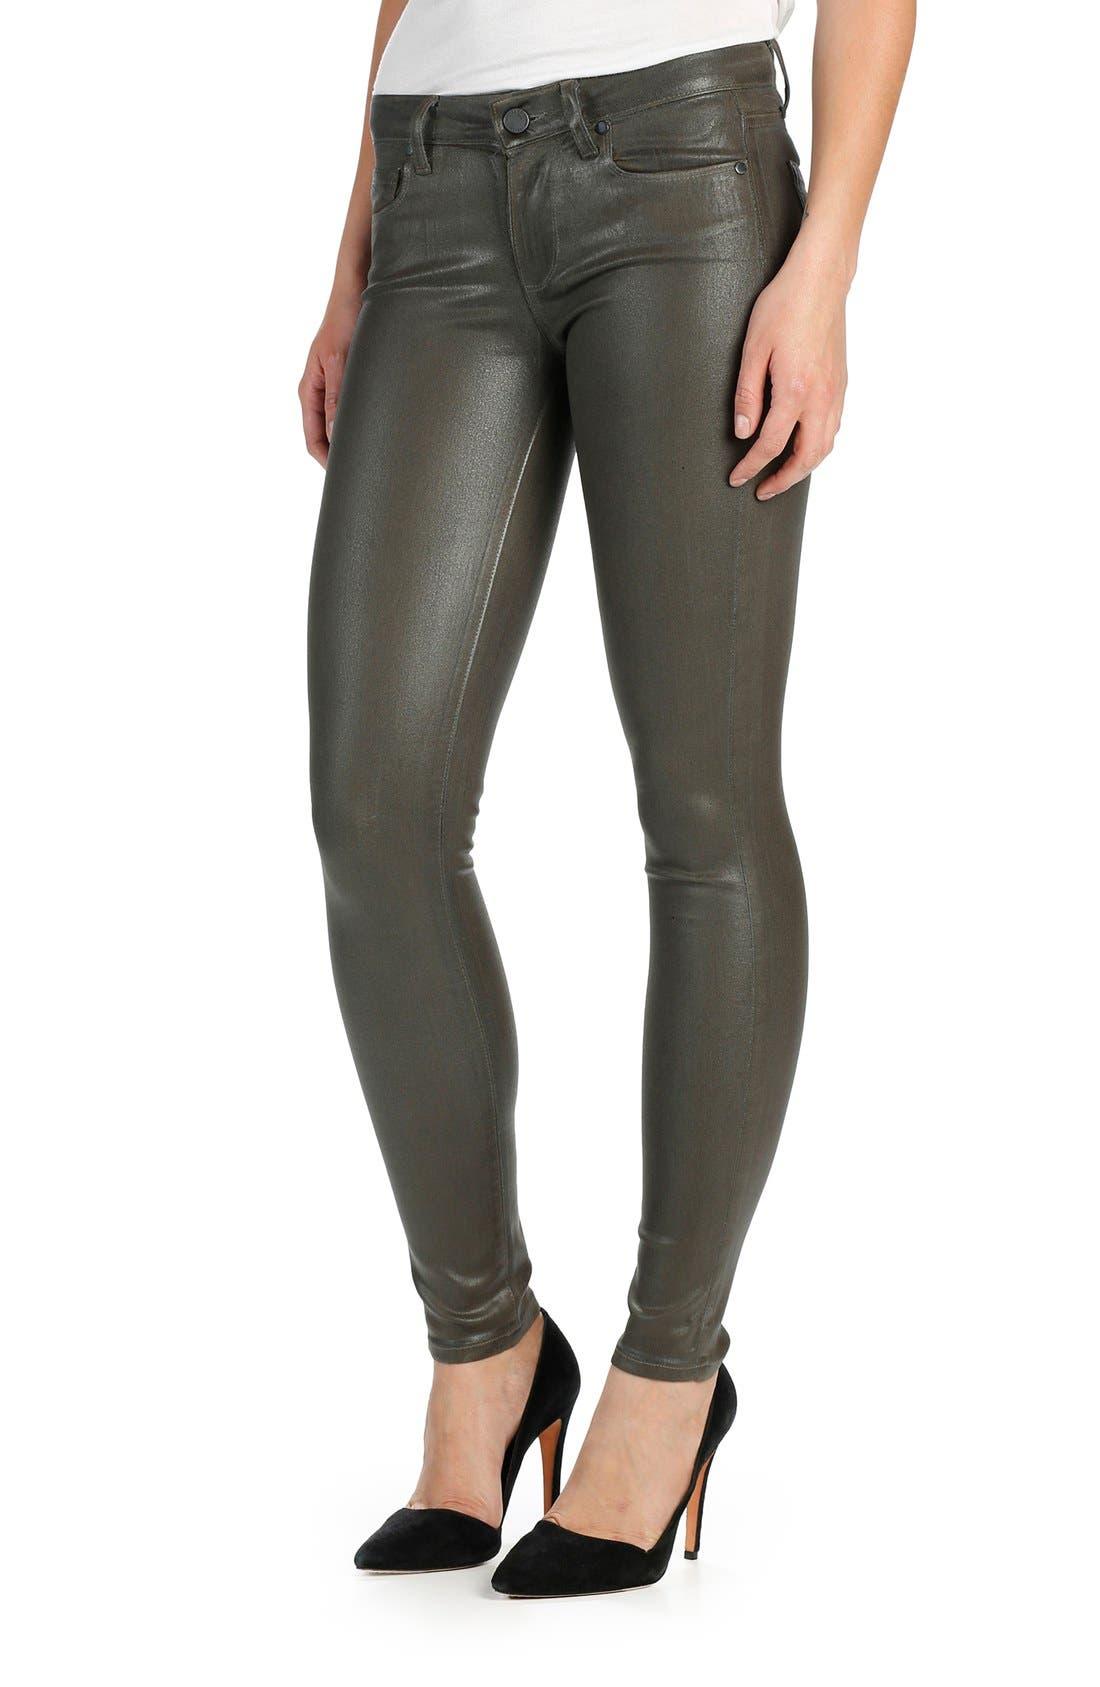 Transcend Verdugo Coated Ultra Skinny Jeans,                             Alternate thumbnail 3, color,                             300